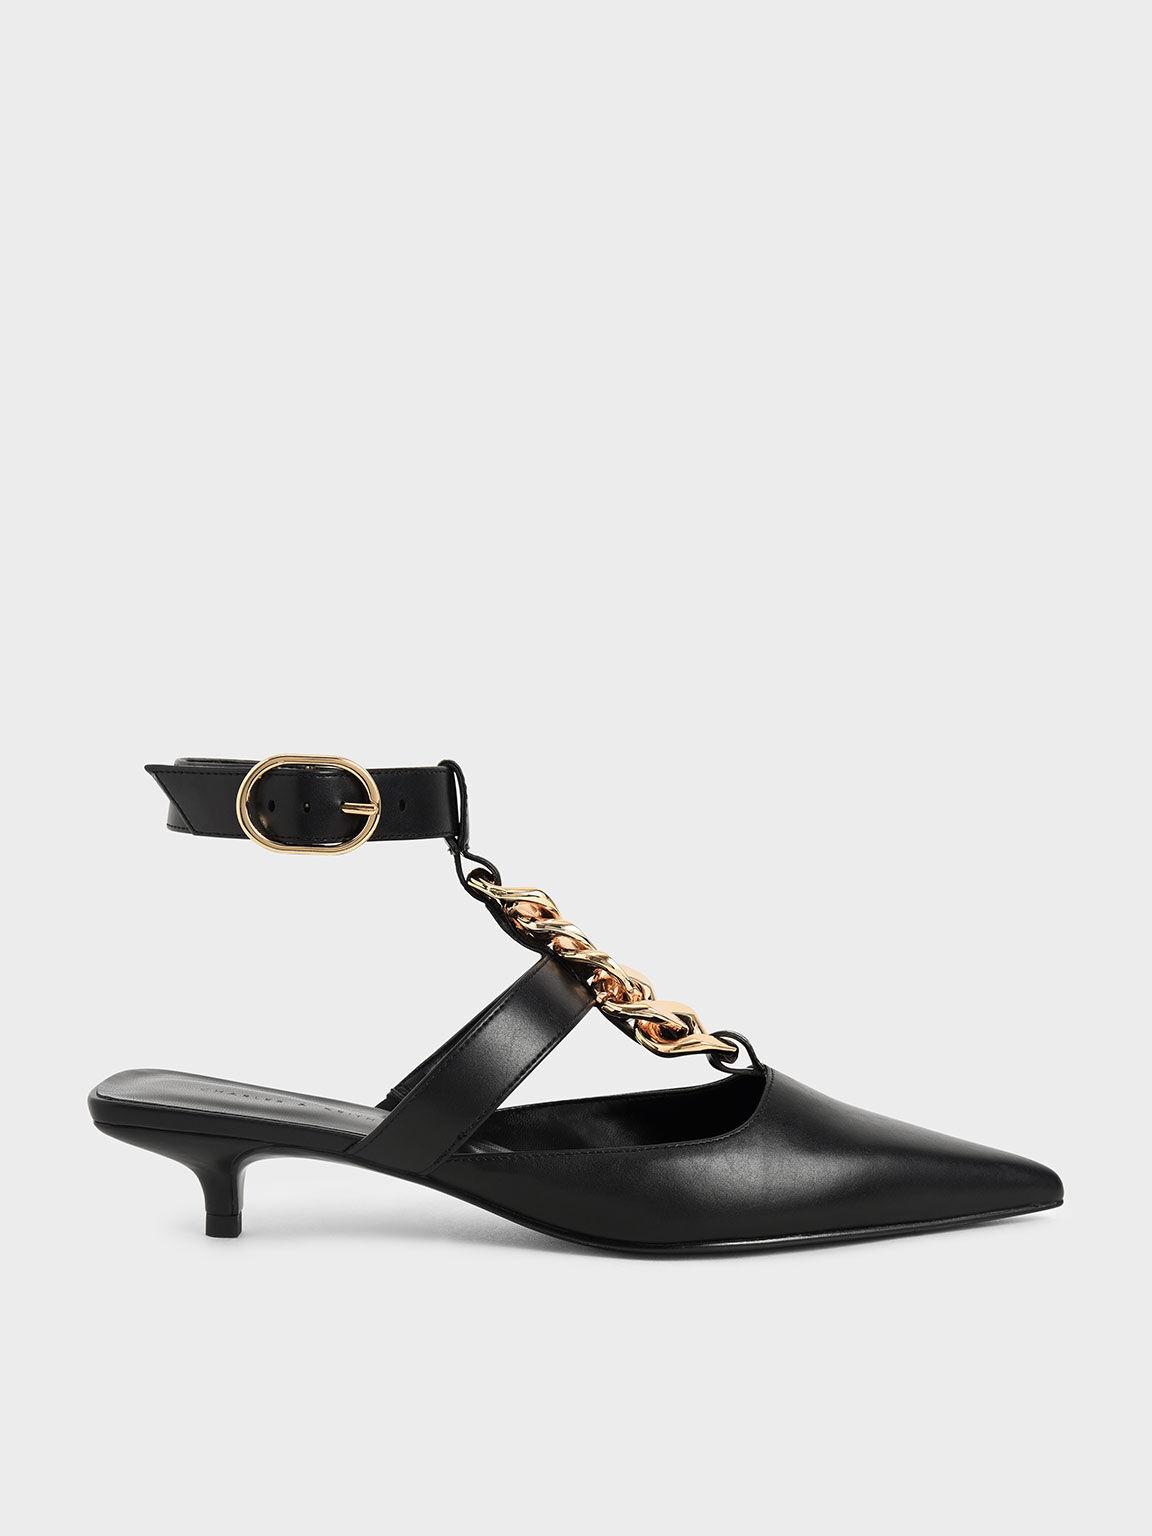 Chain Link Ankle Strap Court Shoes, Black, hi-res